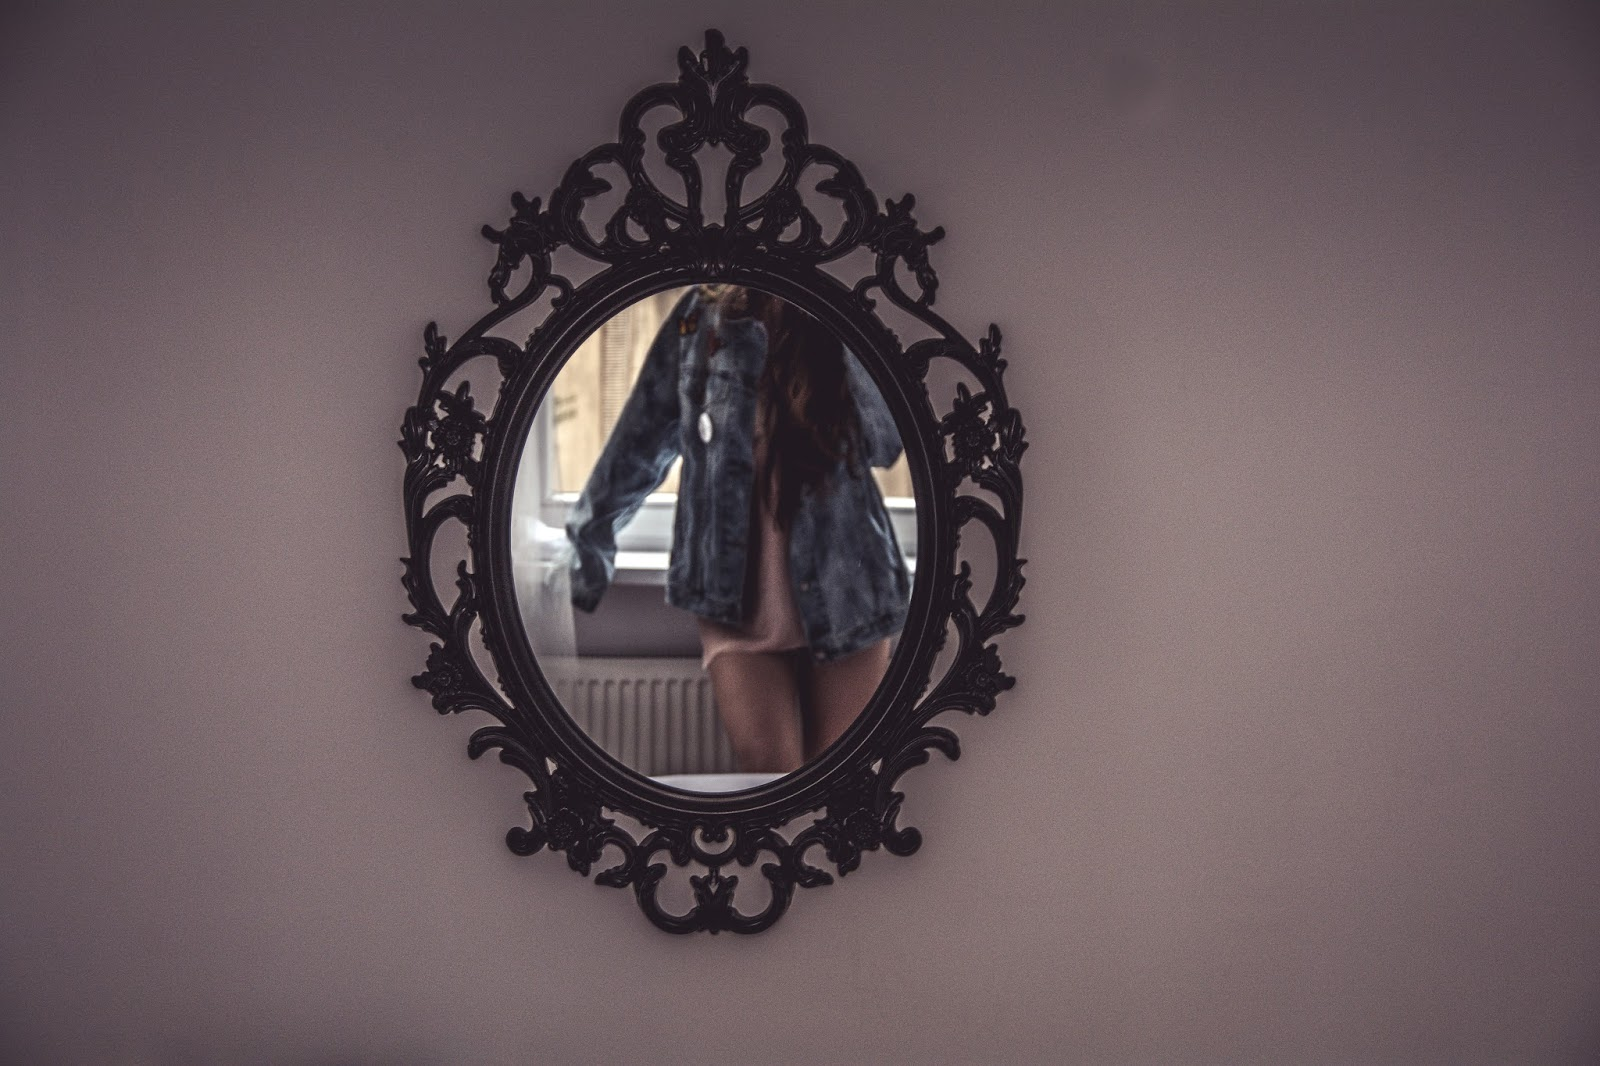 art photo shoot